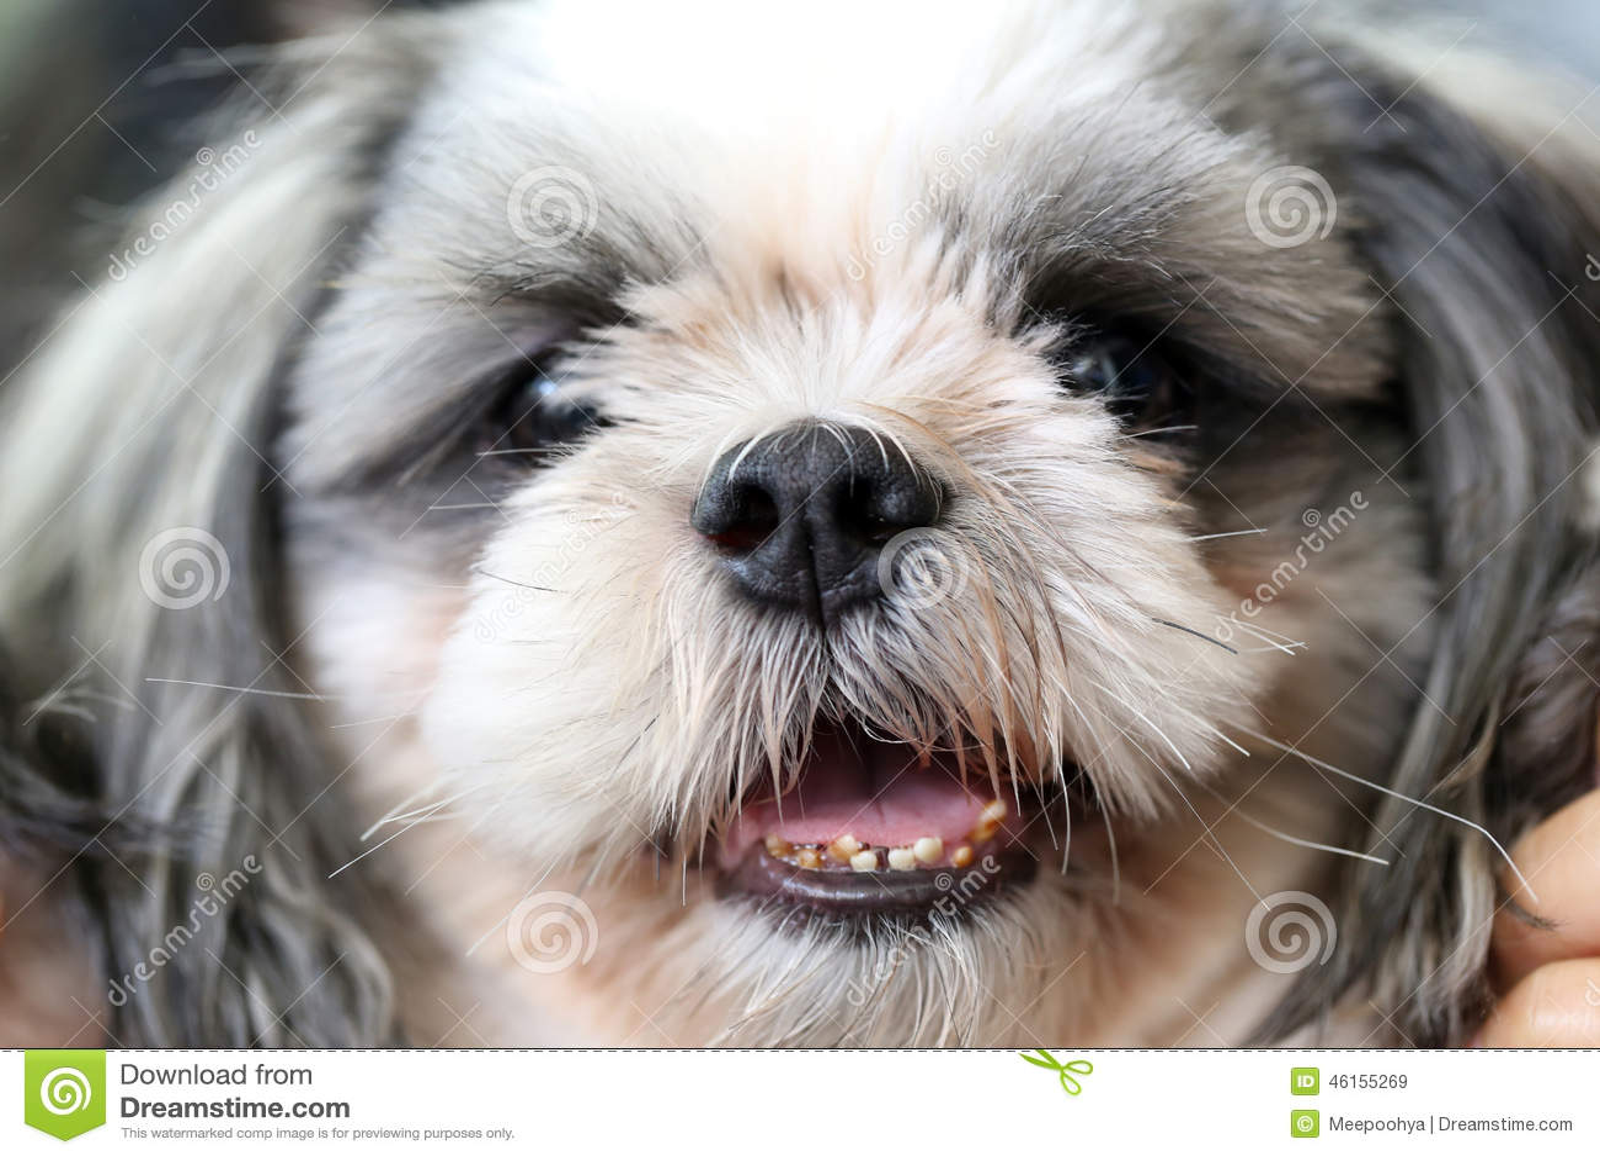 Face of the Shih Tzu dog.